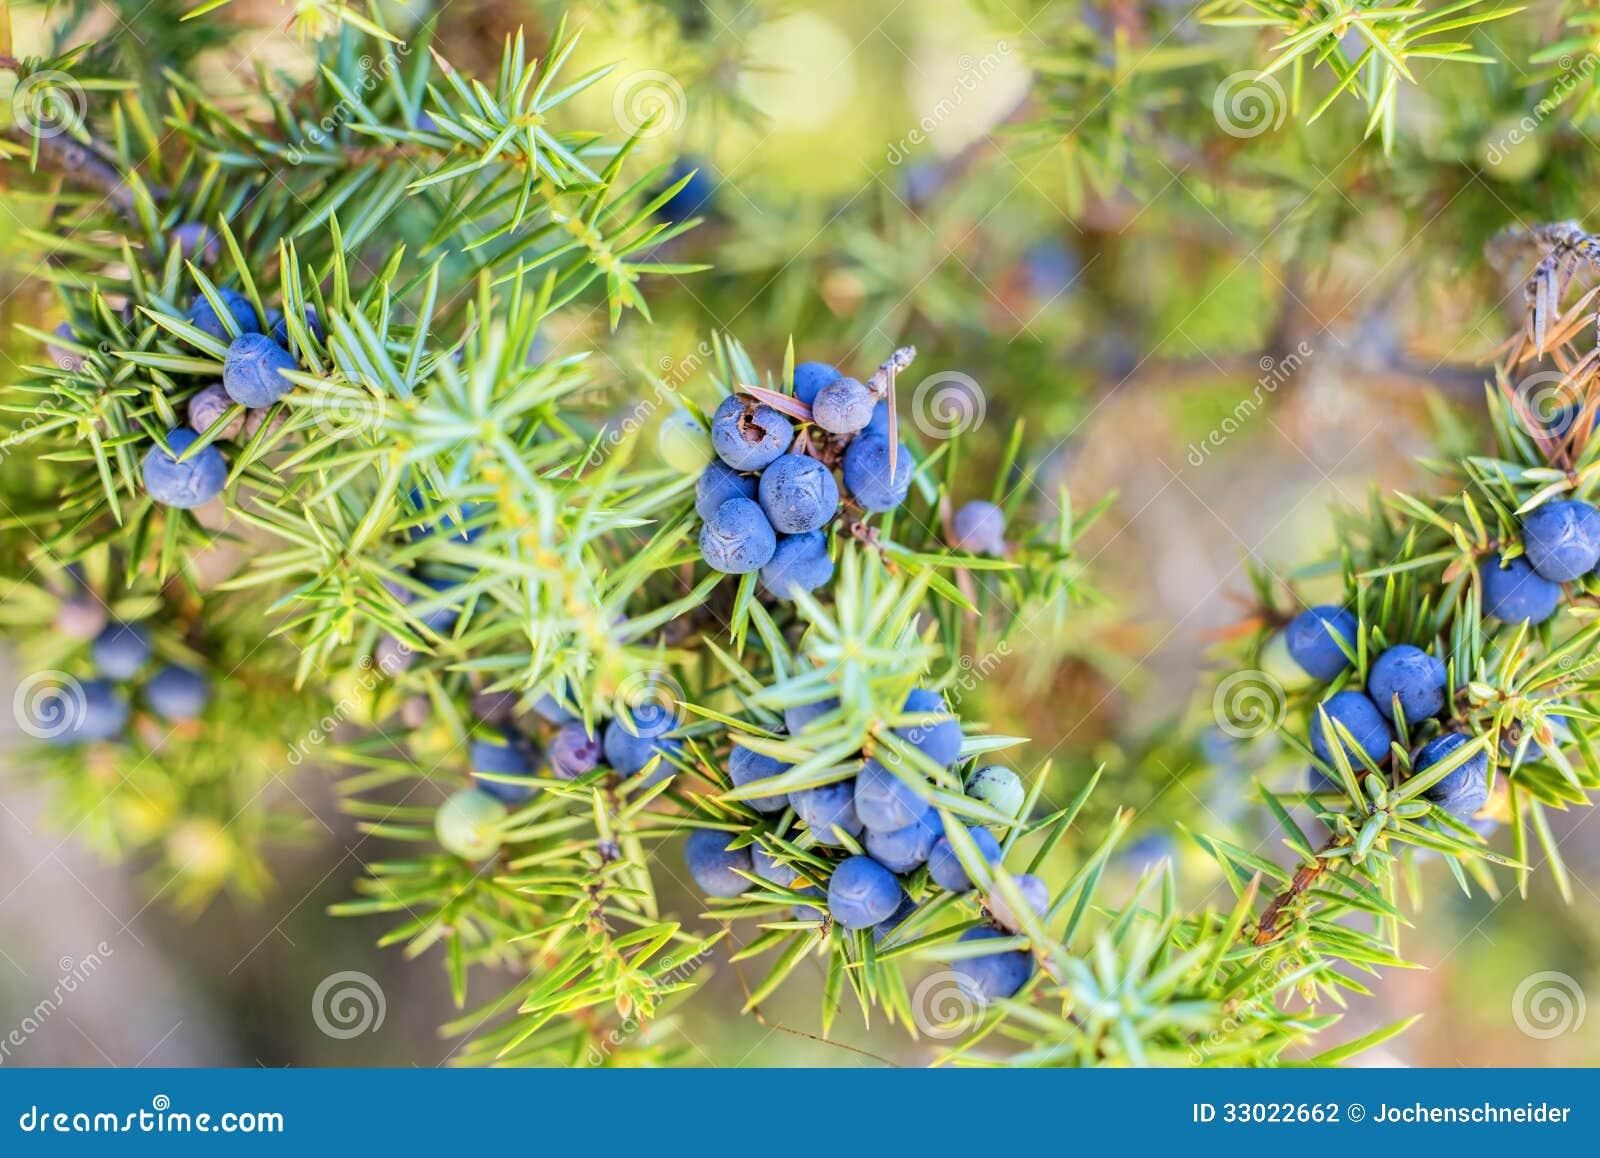 juniper berries stock photography image 33022662